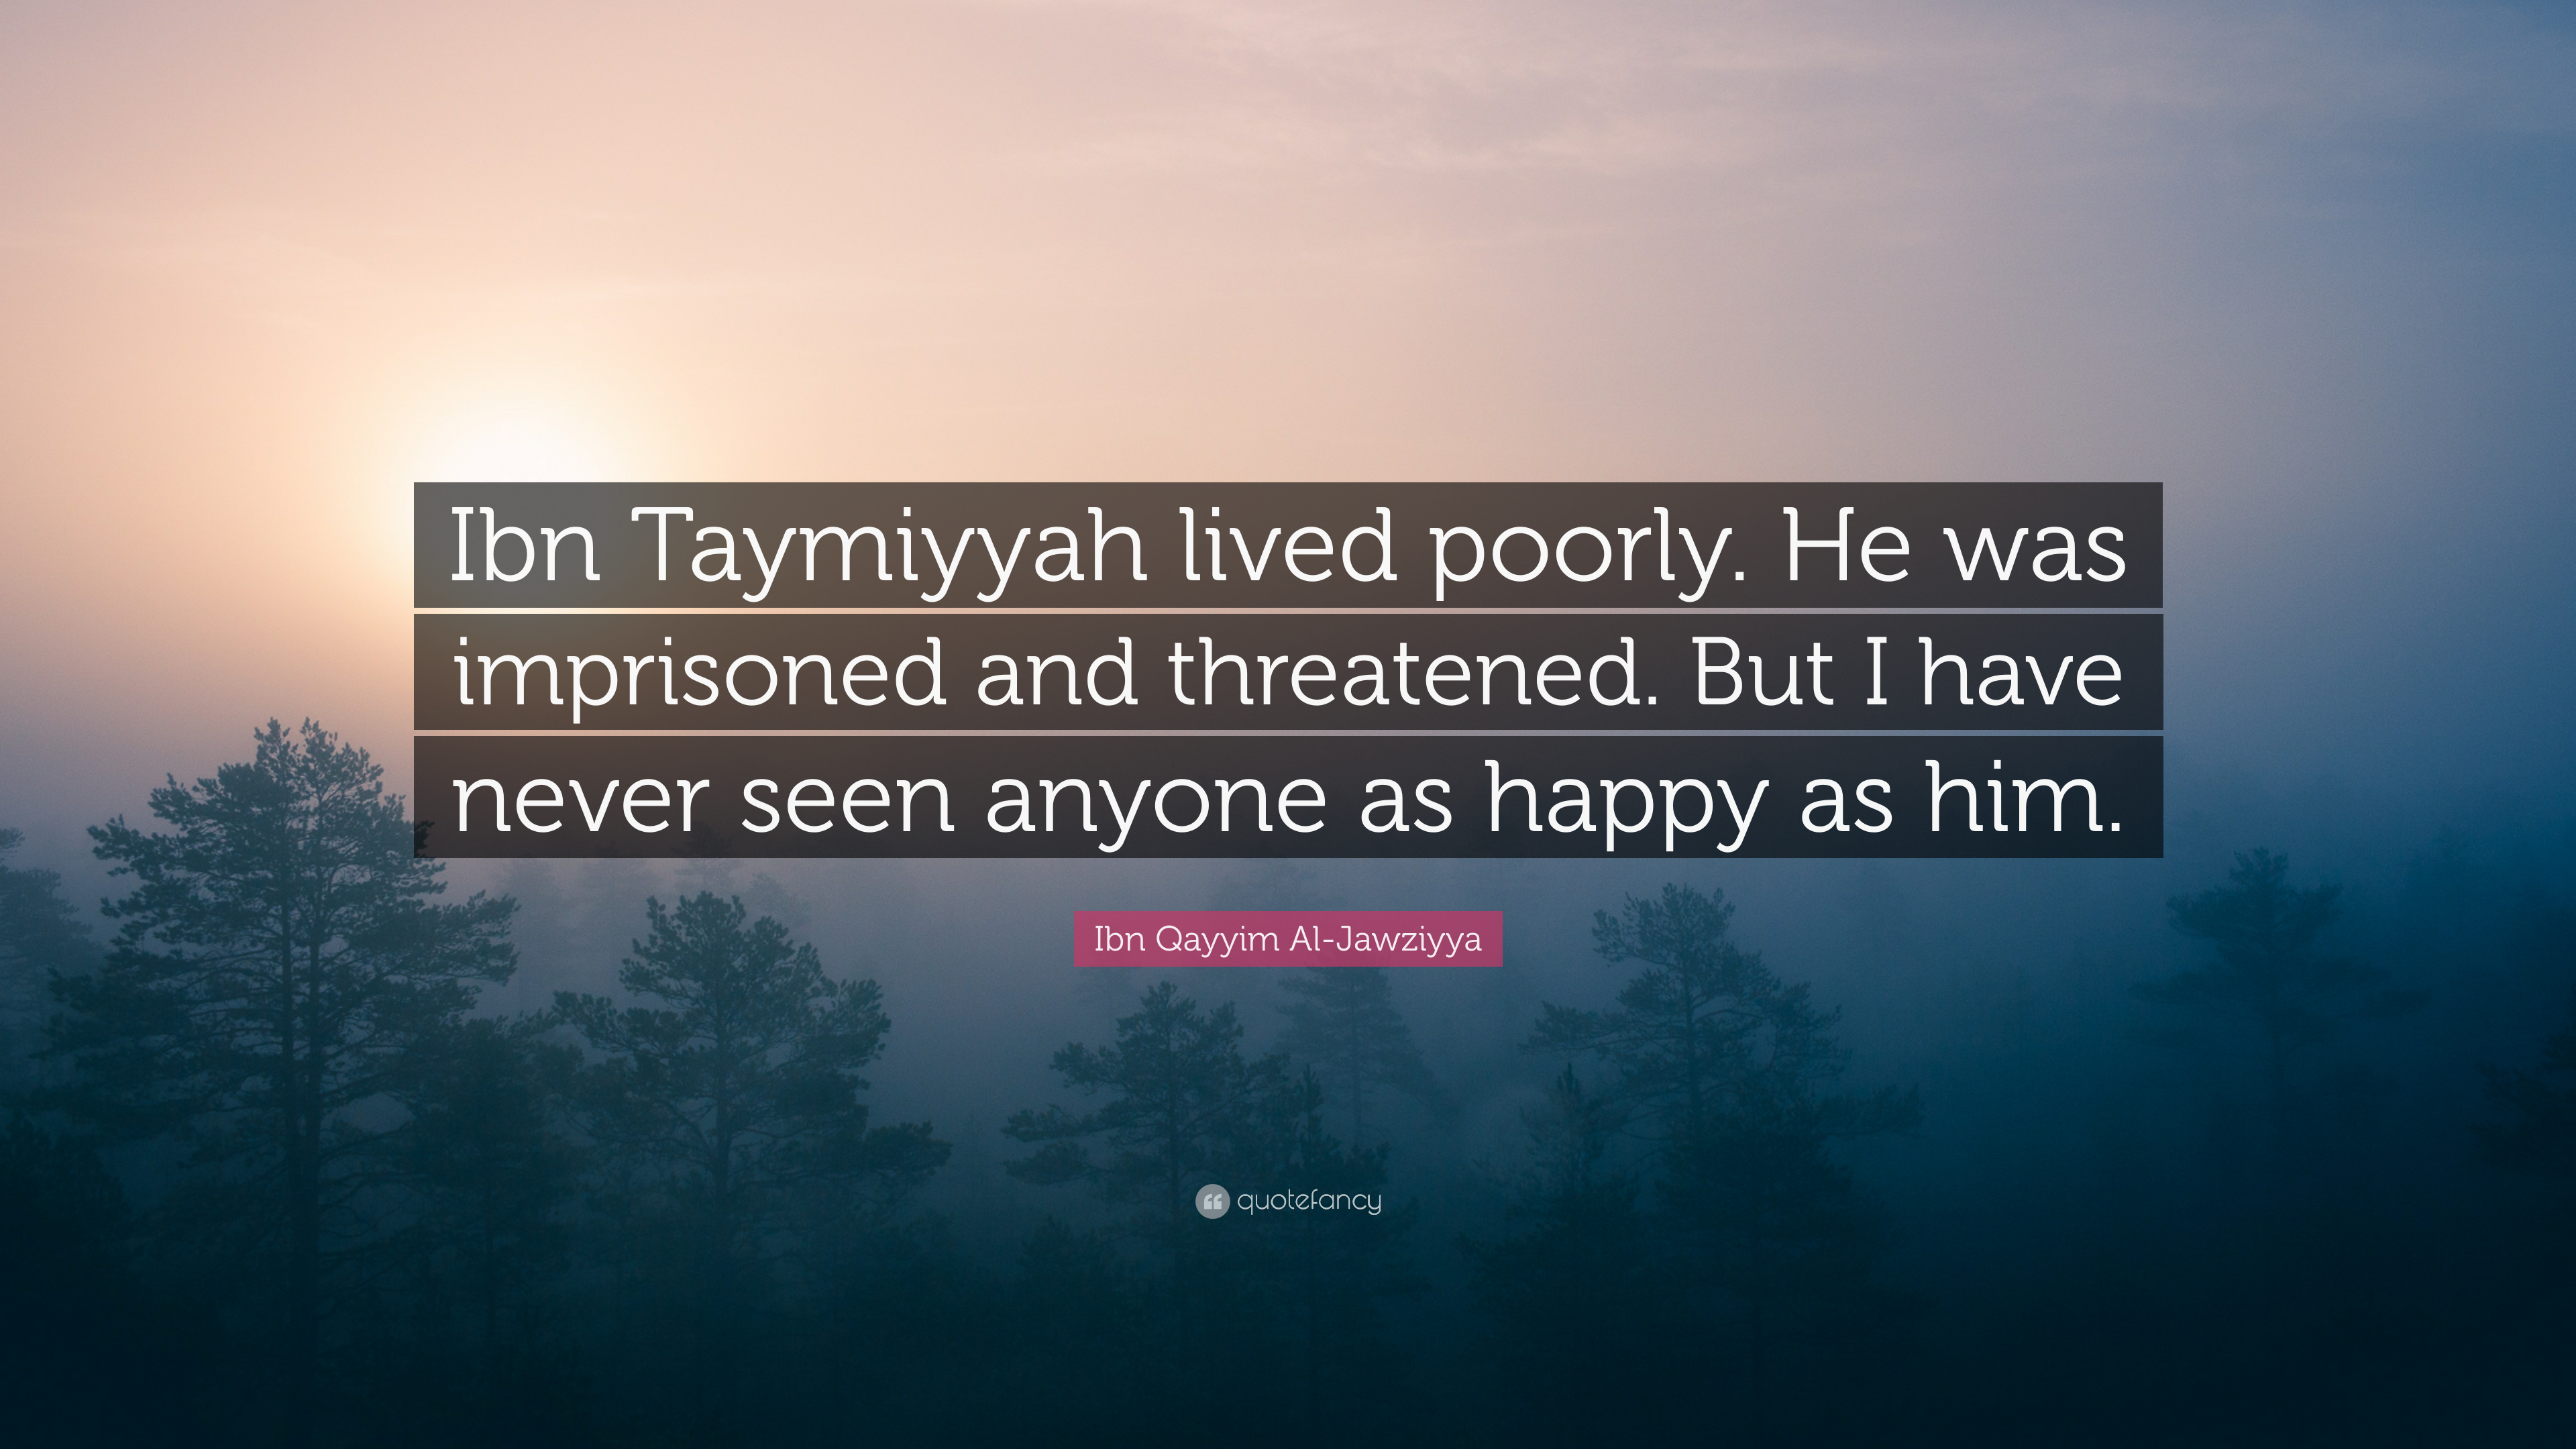 "Ibn Qayyim Al-Jawziyya Quote: ""Ibn Taymiyyah lived poorly. He was ..."